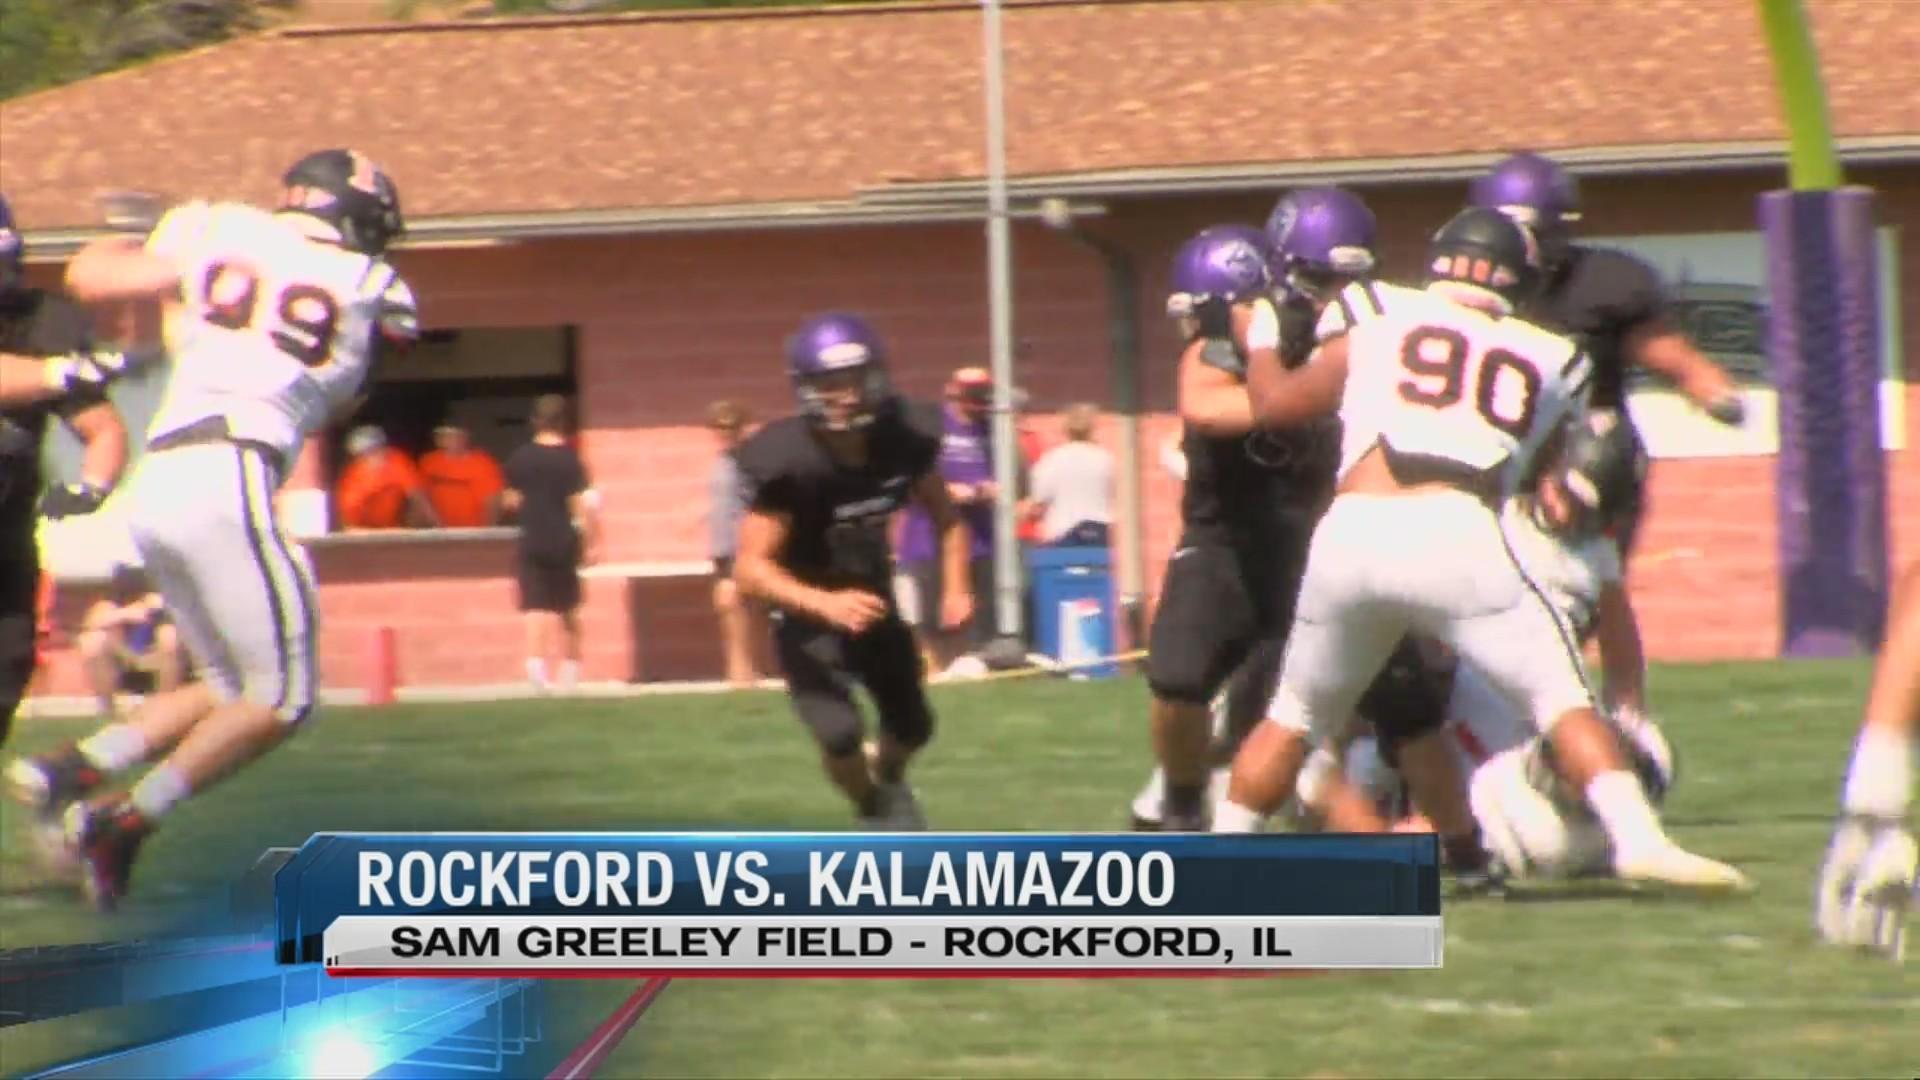 Rockford vs. Kalamazoo